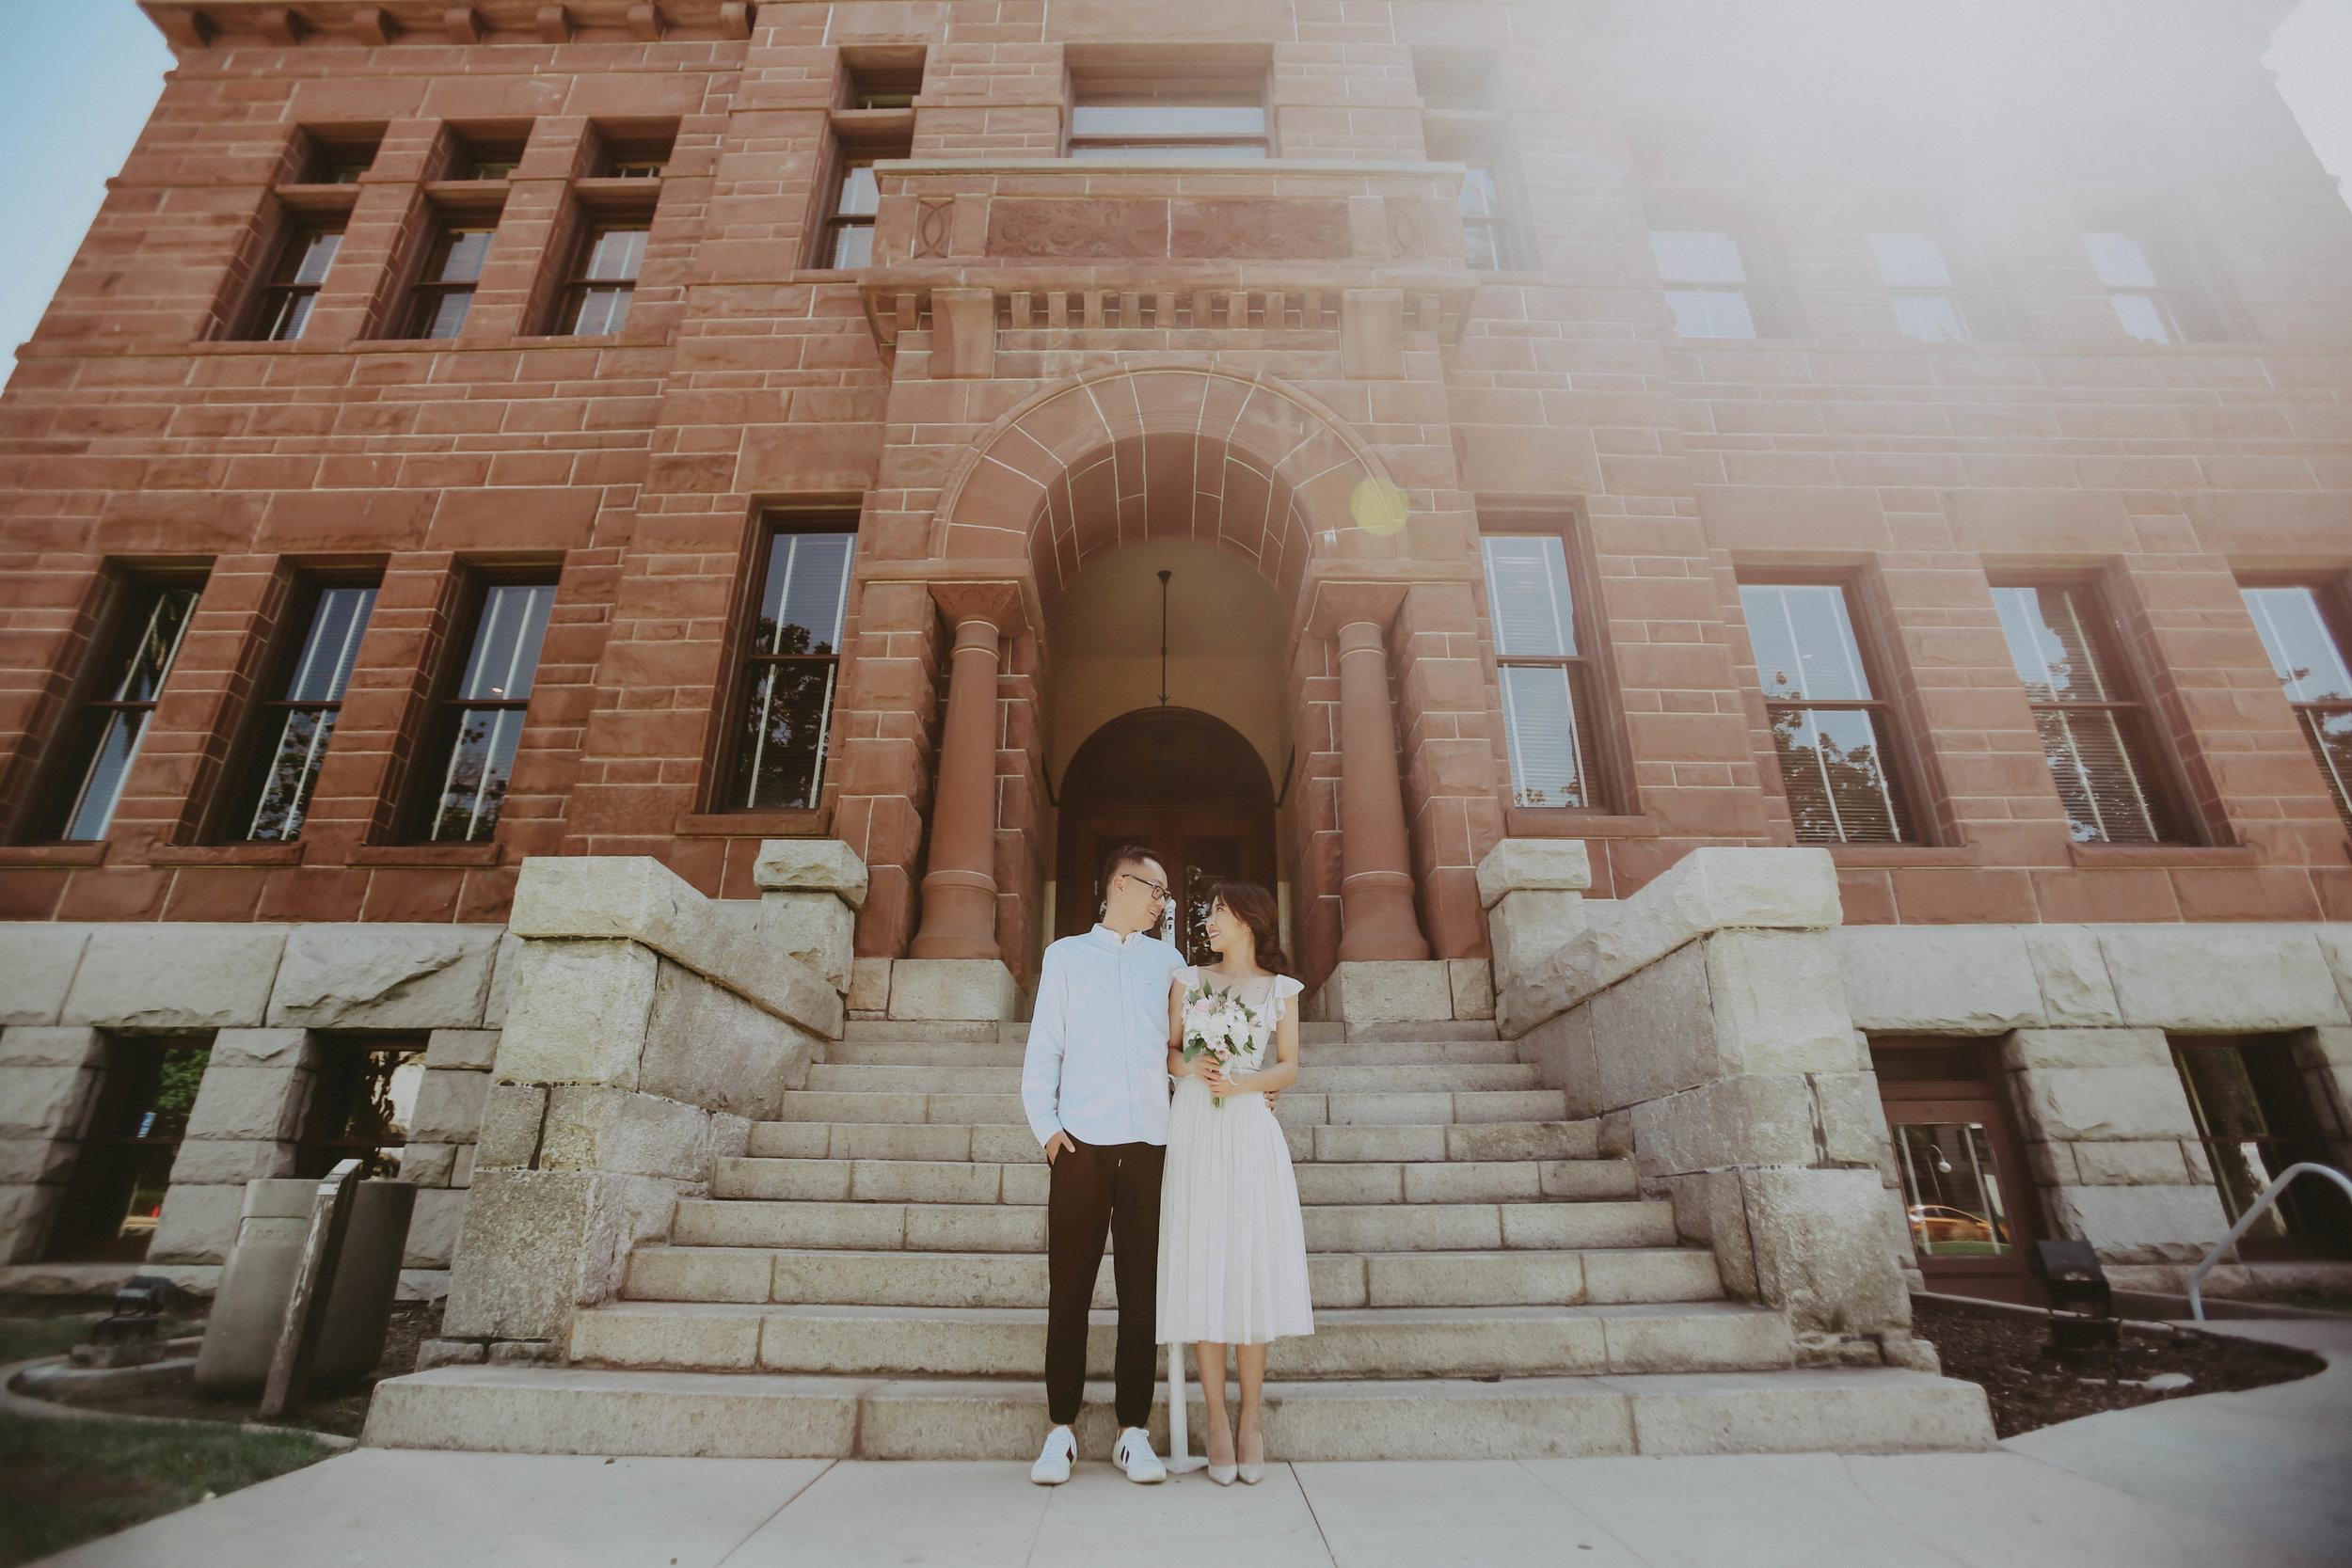 Orange County Wedding Photographer | Santa Ana, CA Old Orange County Courthouse Wedding